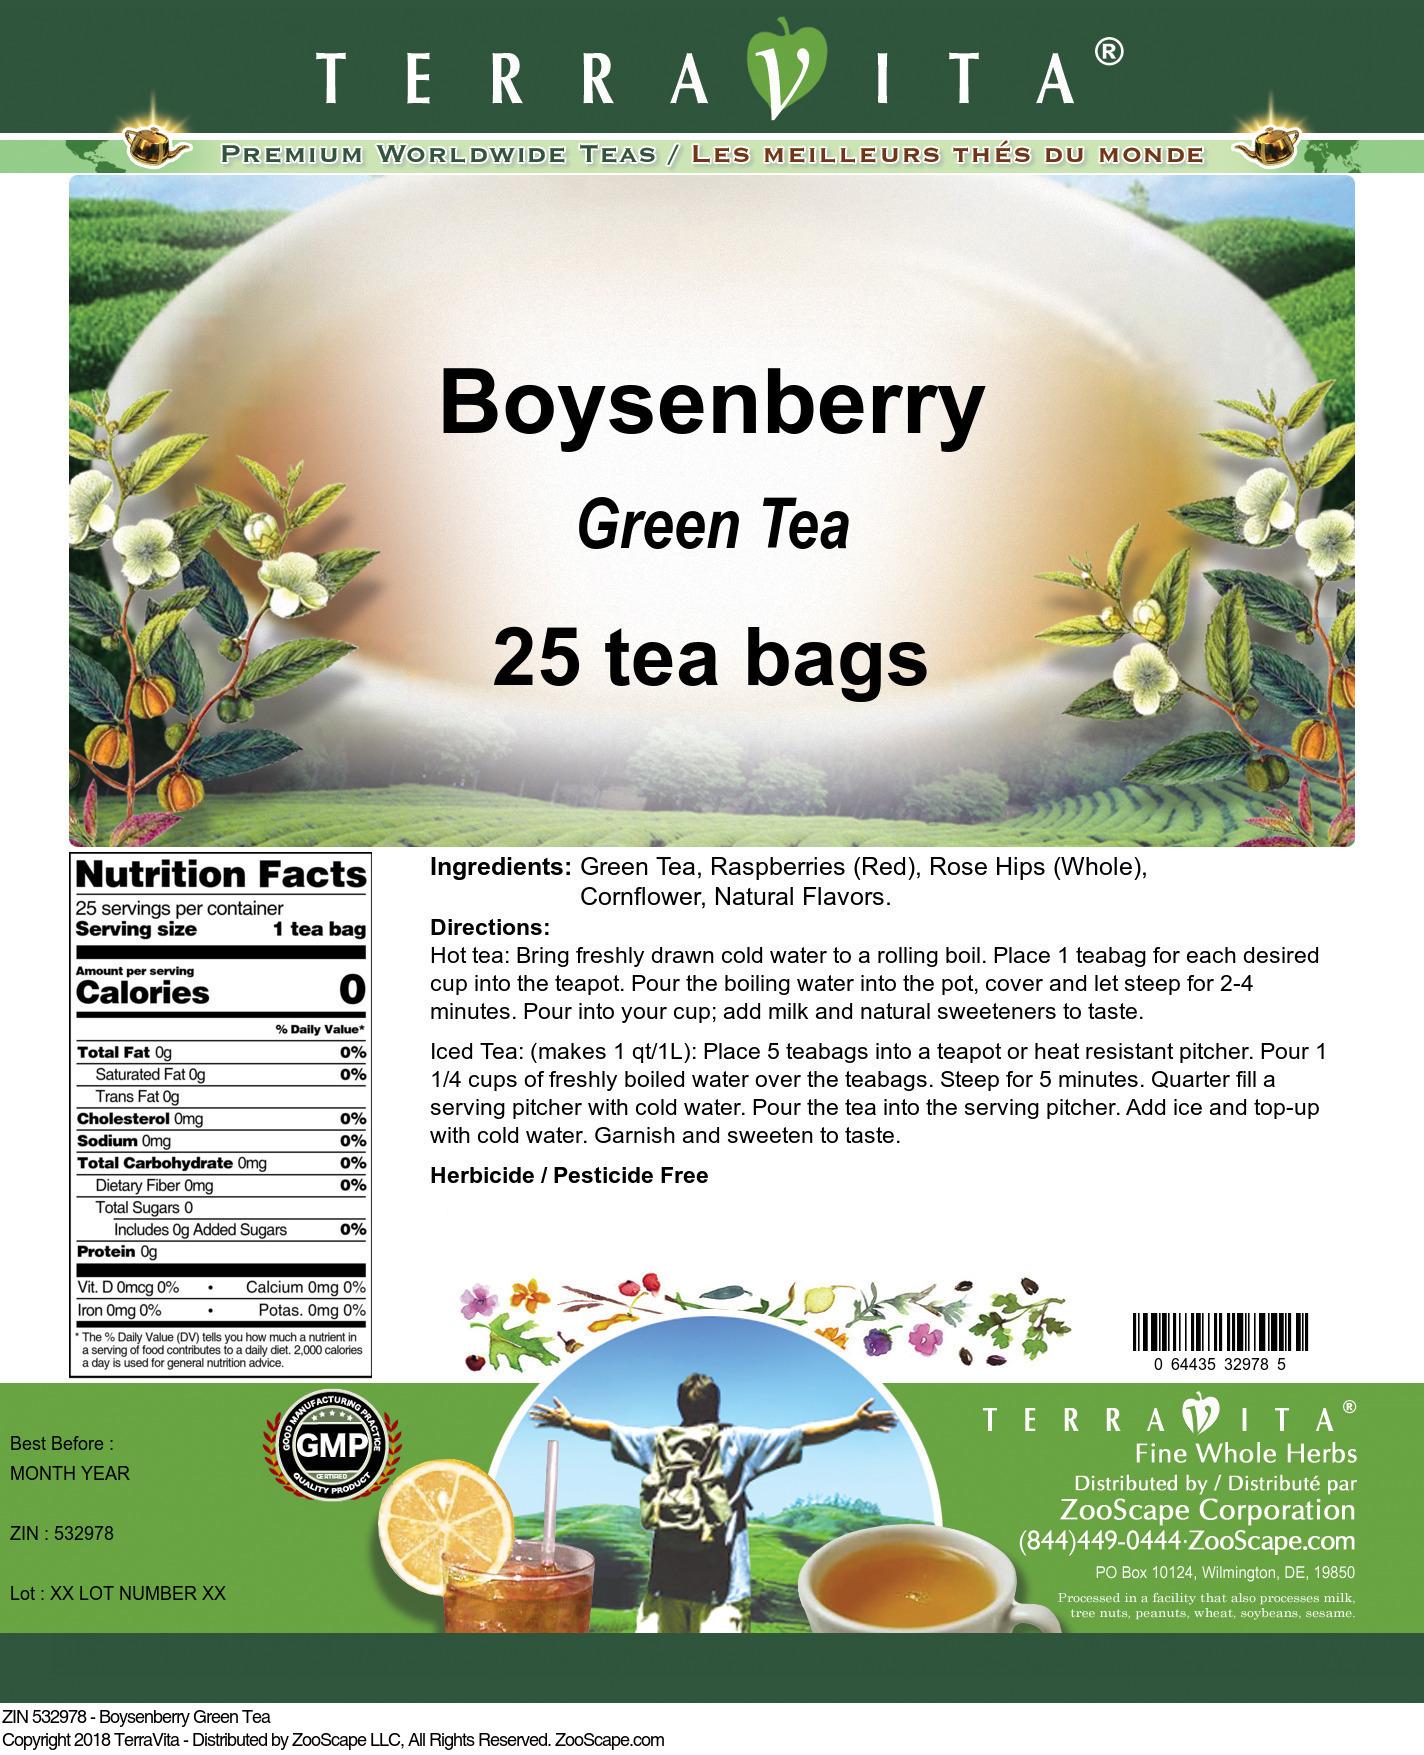 Boysenberry Green Tea